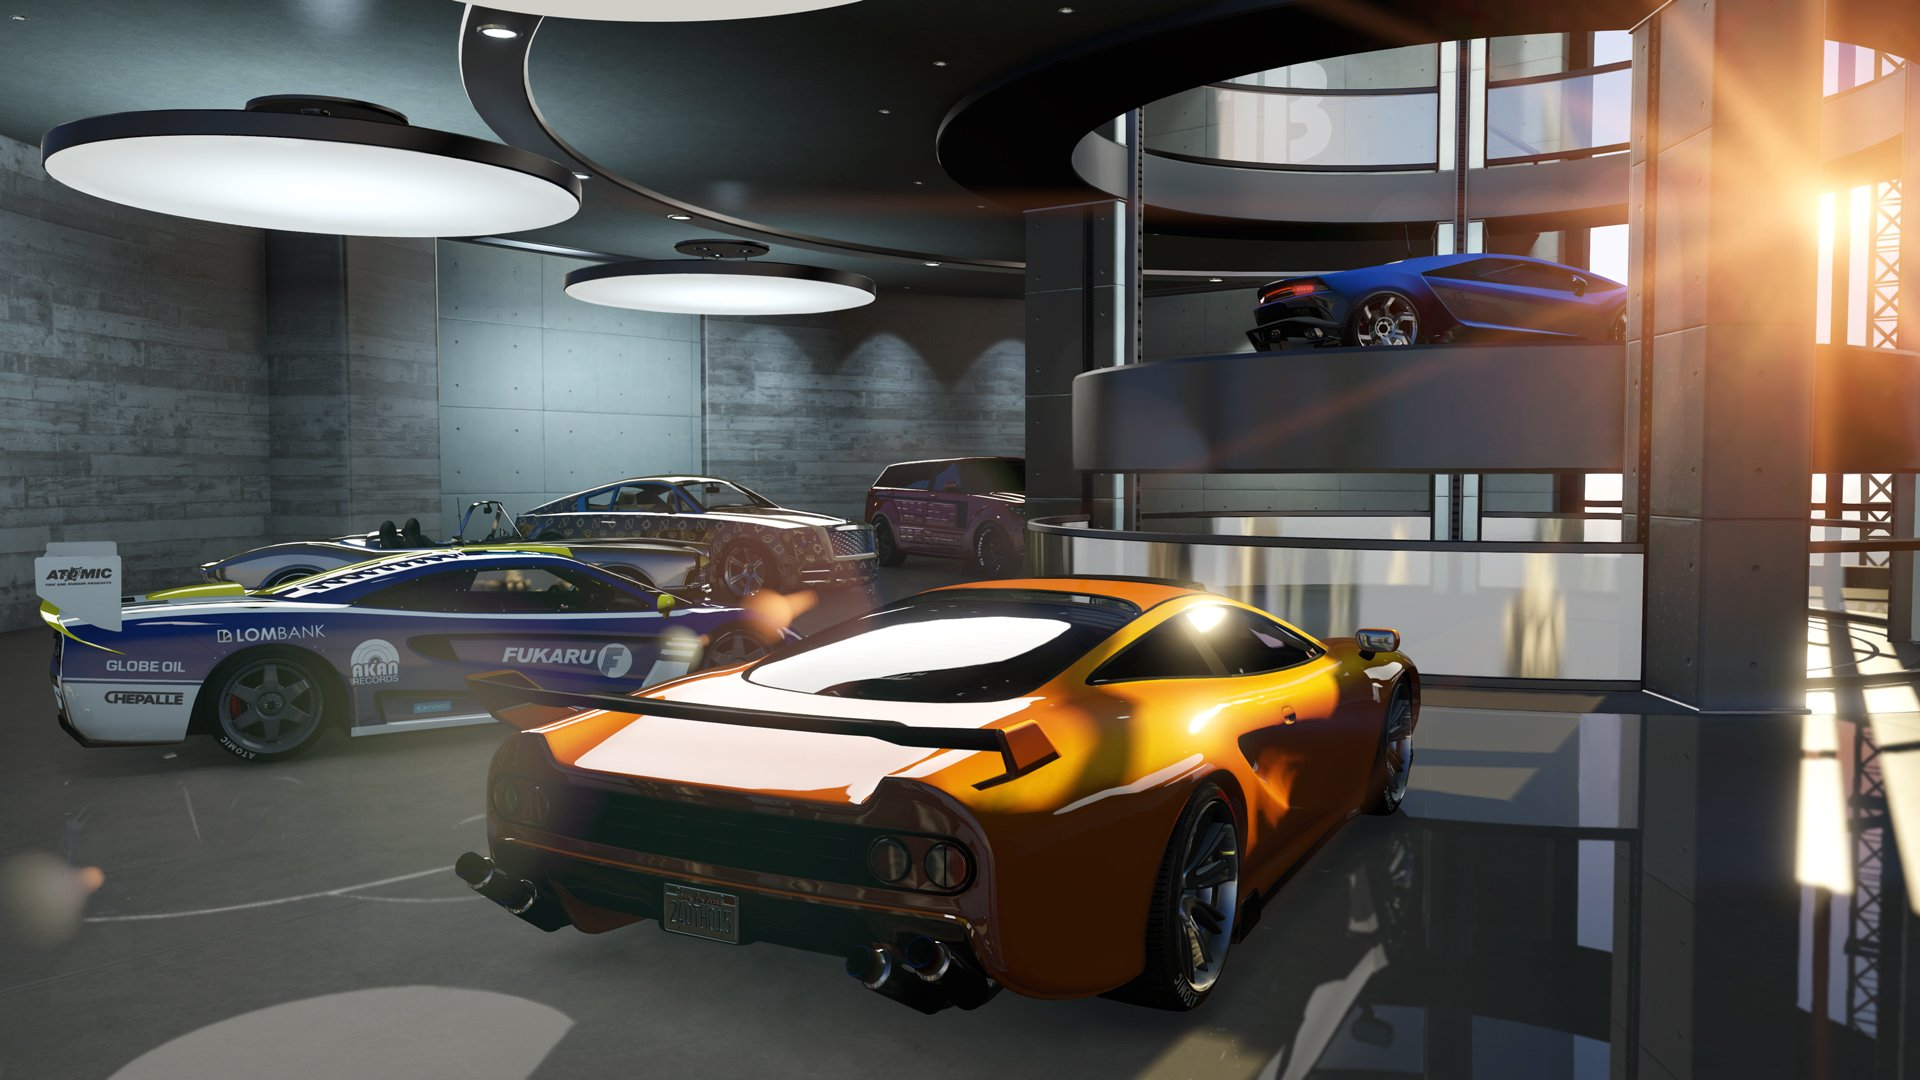 grand theft auto V gratis gta online GTA 5 gratis